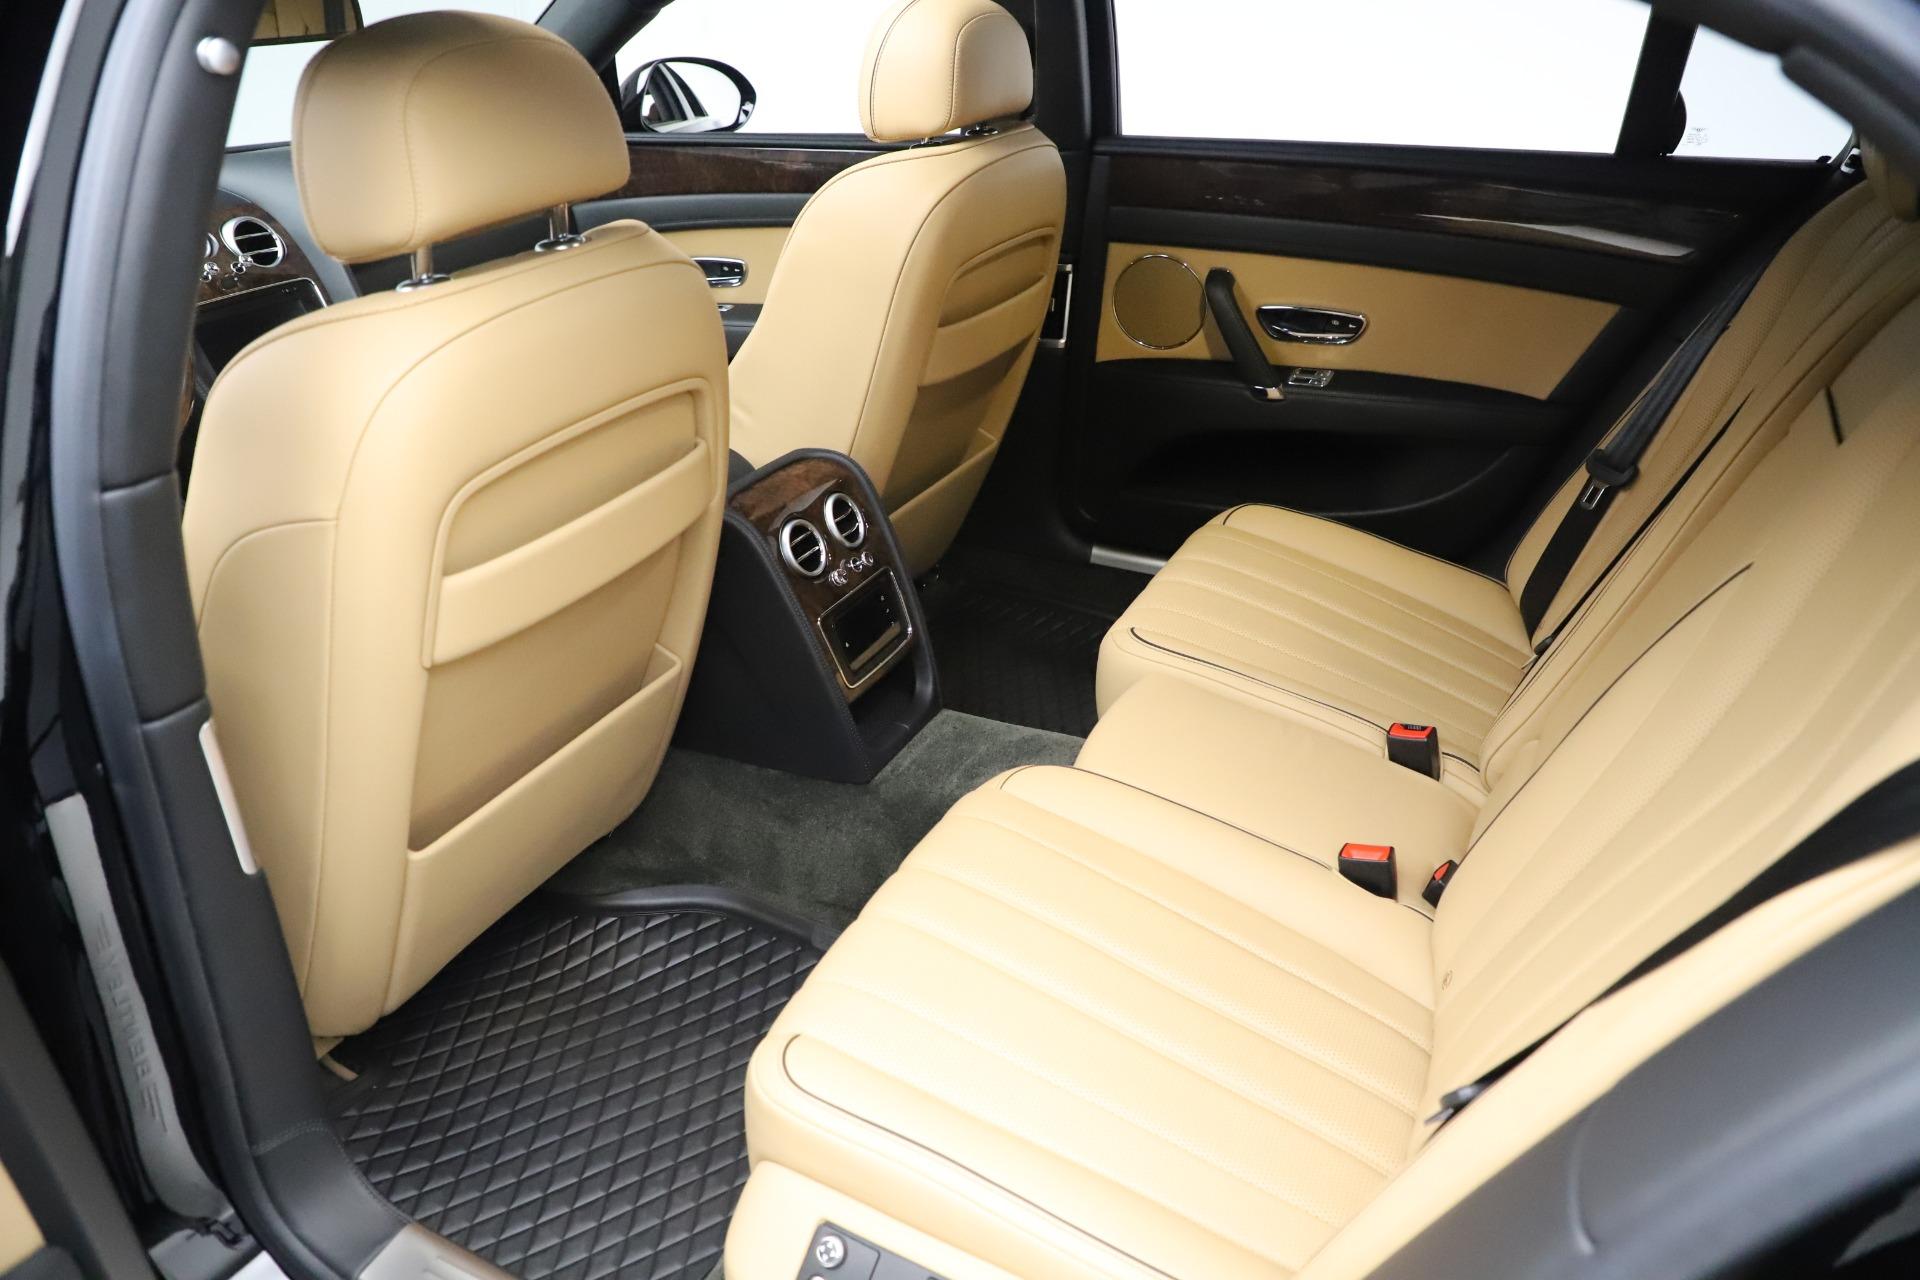 Used 2016 Bentley Flying Spur V8 For Sale In Westport, CT 3526_p21